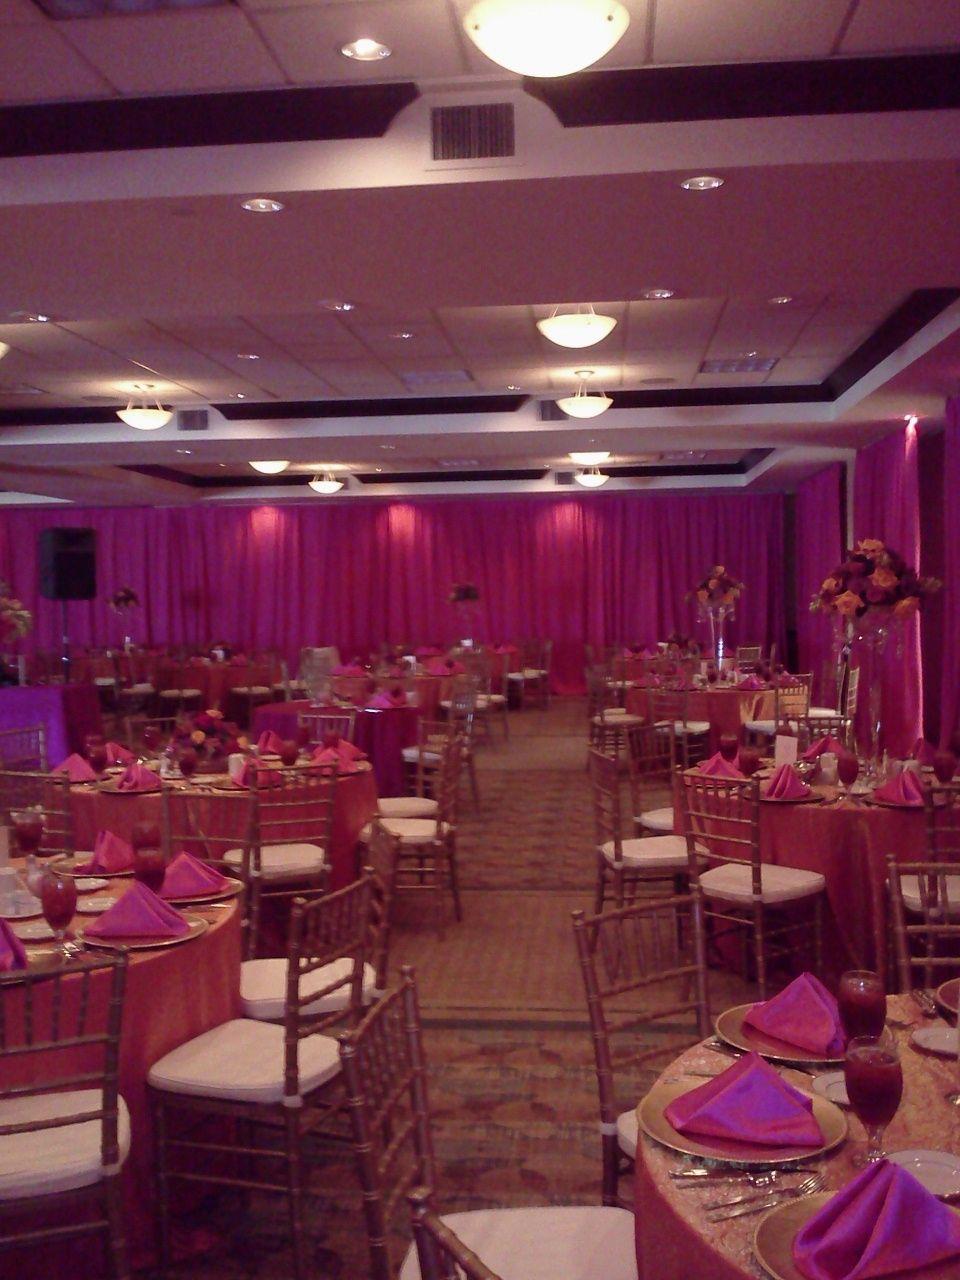 @Sarah Hilton Garden Inn Lakeland Pink Wedding   Ballroom Decked Out In  Pink Satin Great Ideas